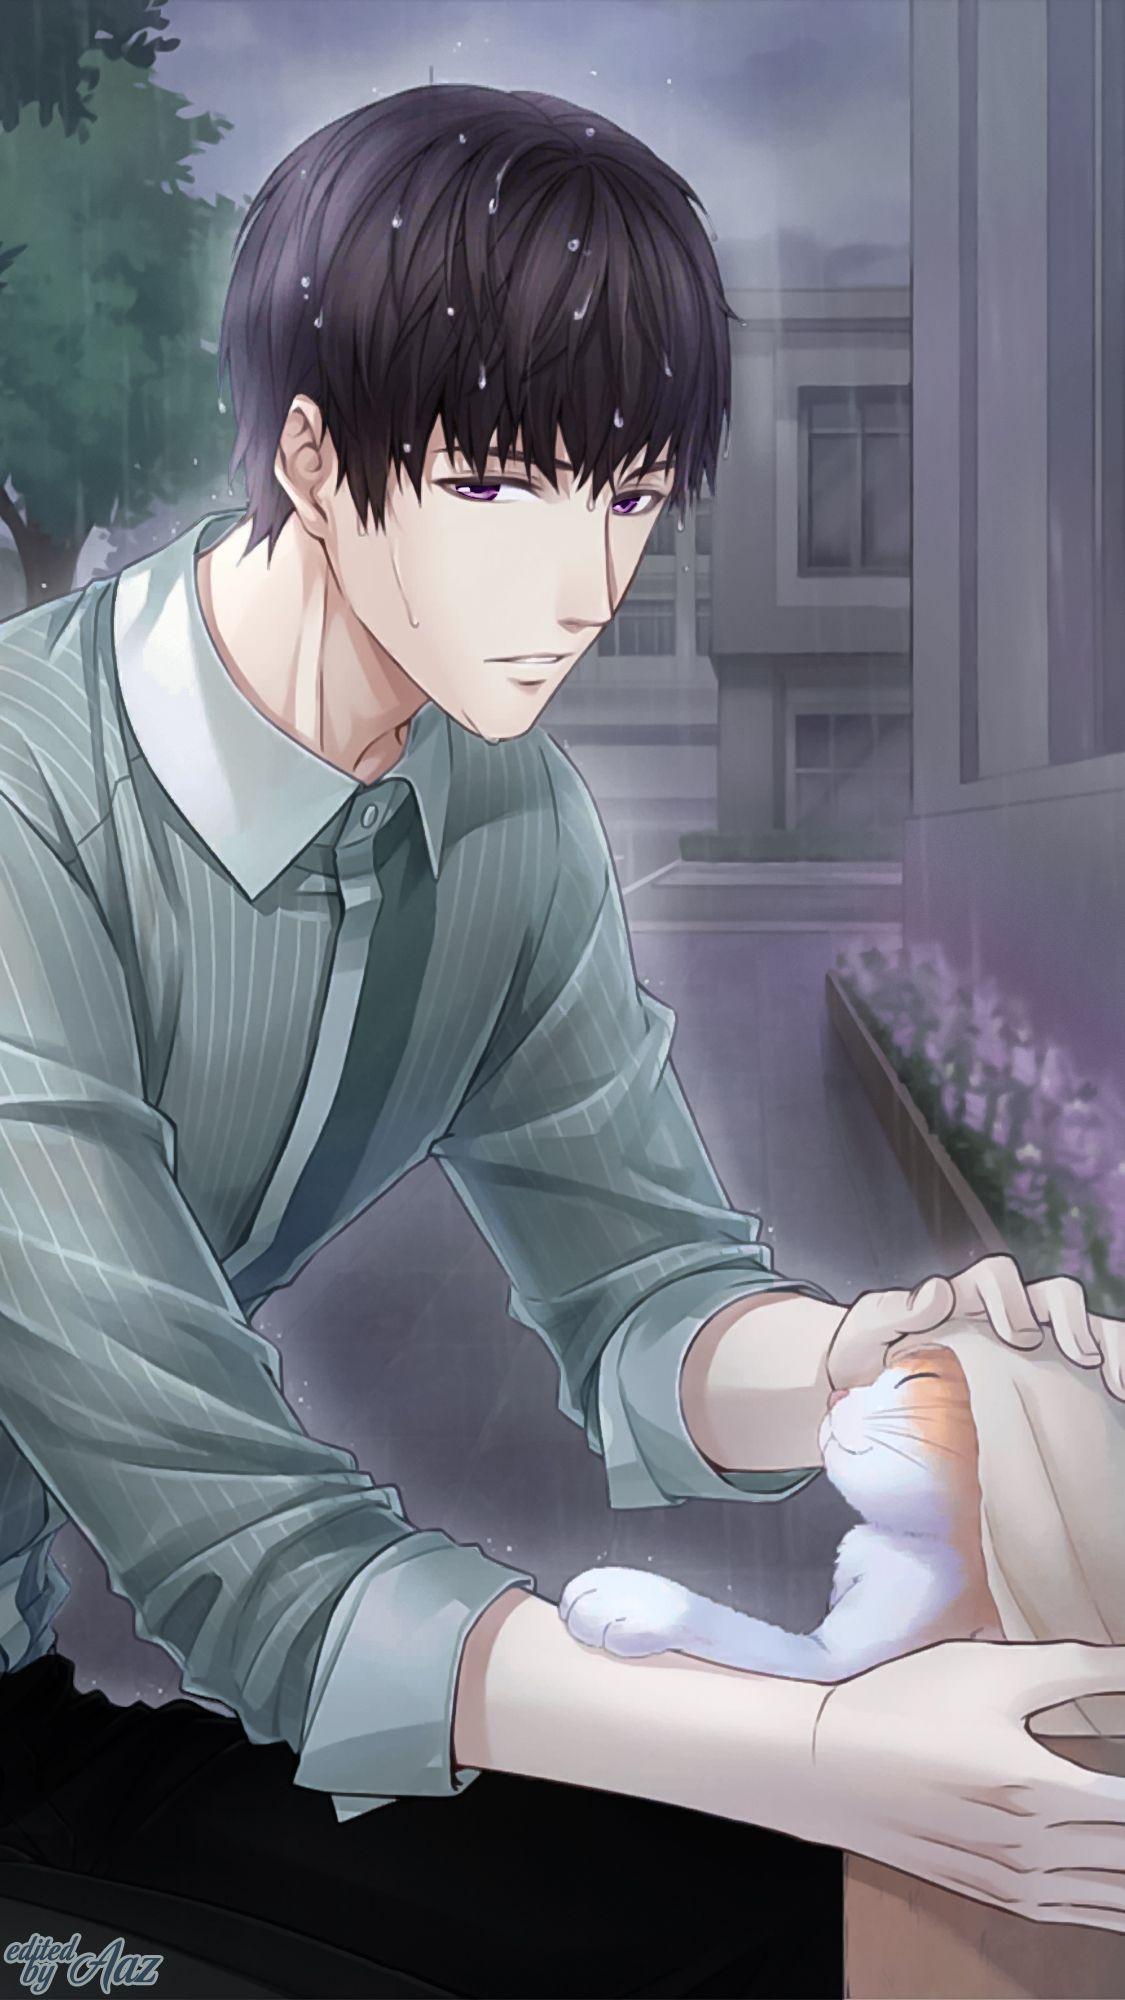 Lucien Encounter in 2020 Romantic anime, Anime, Anime love